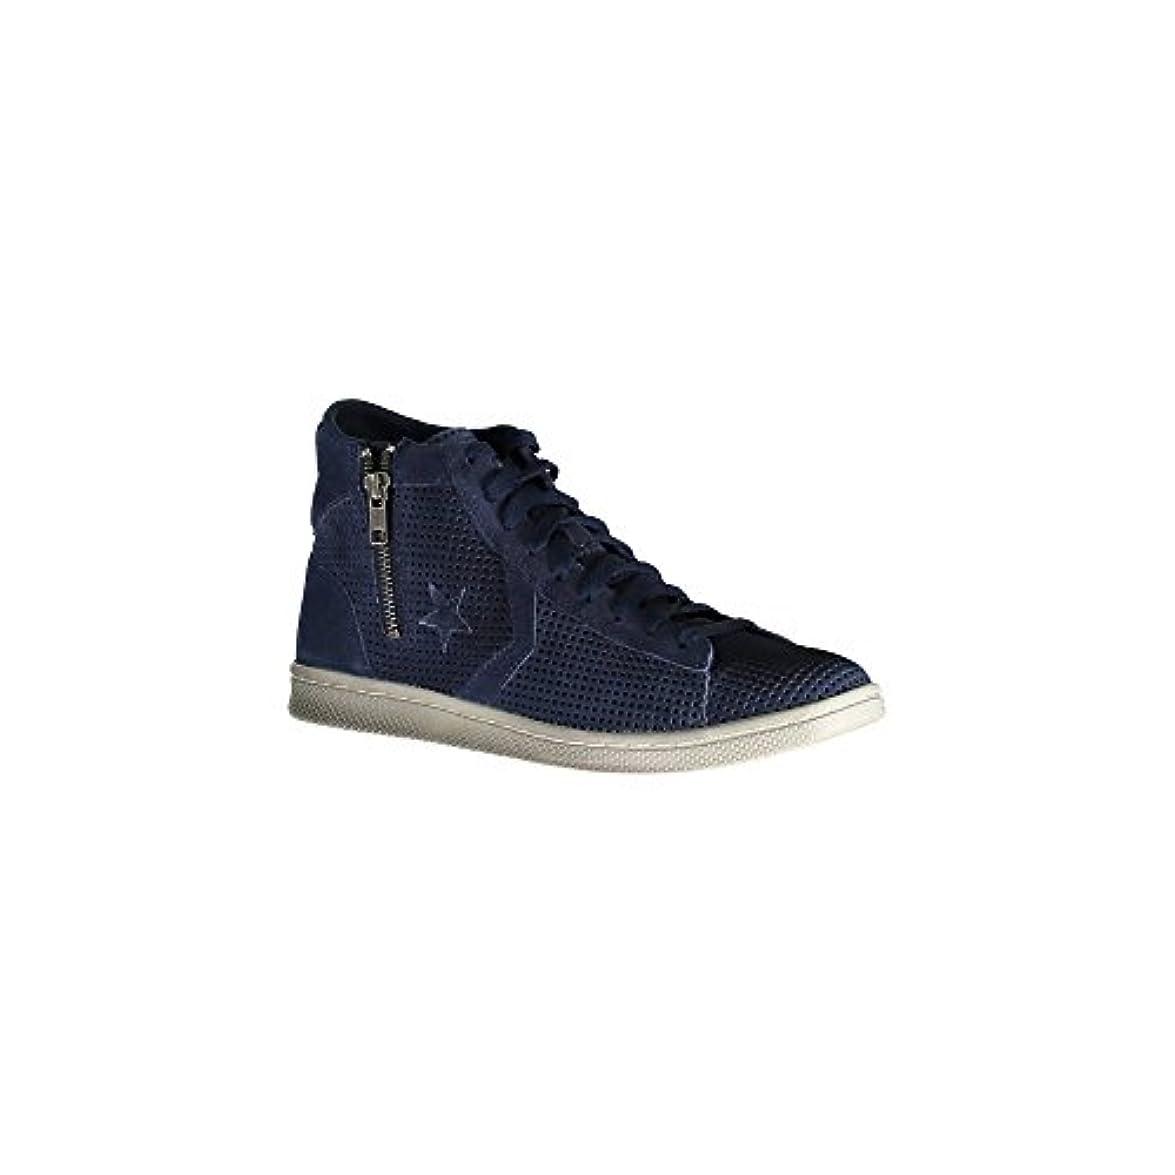 Converse Sneaker Alta Pro Lea Lp Mid Suede Zip Perf Blu Scuro Eu 37